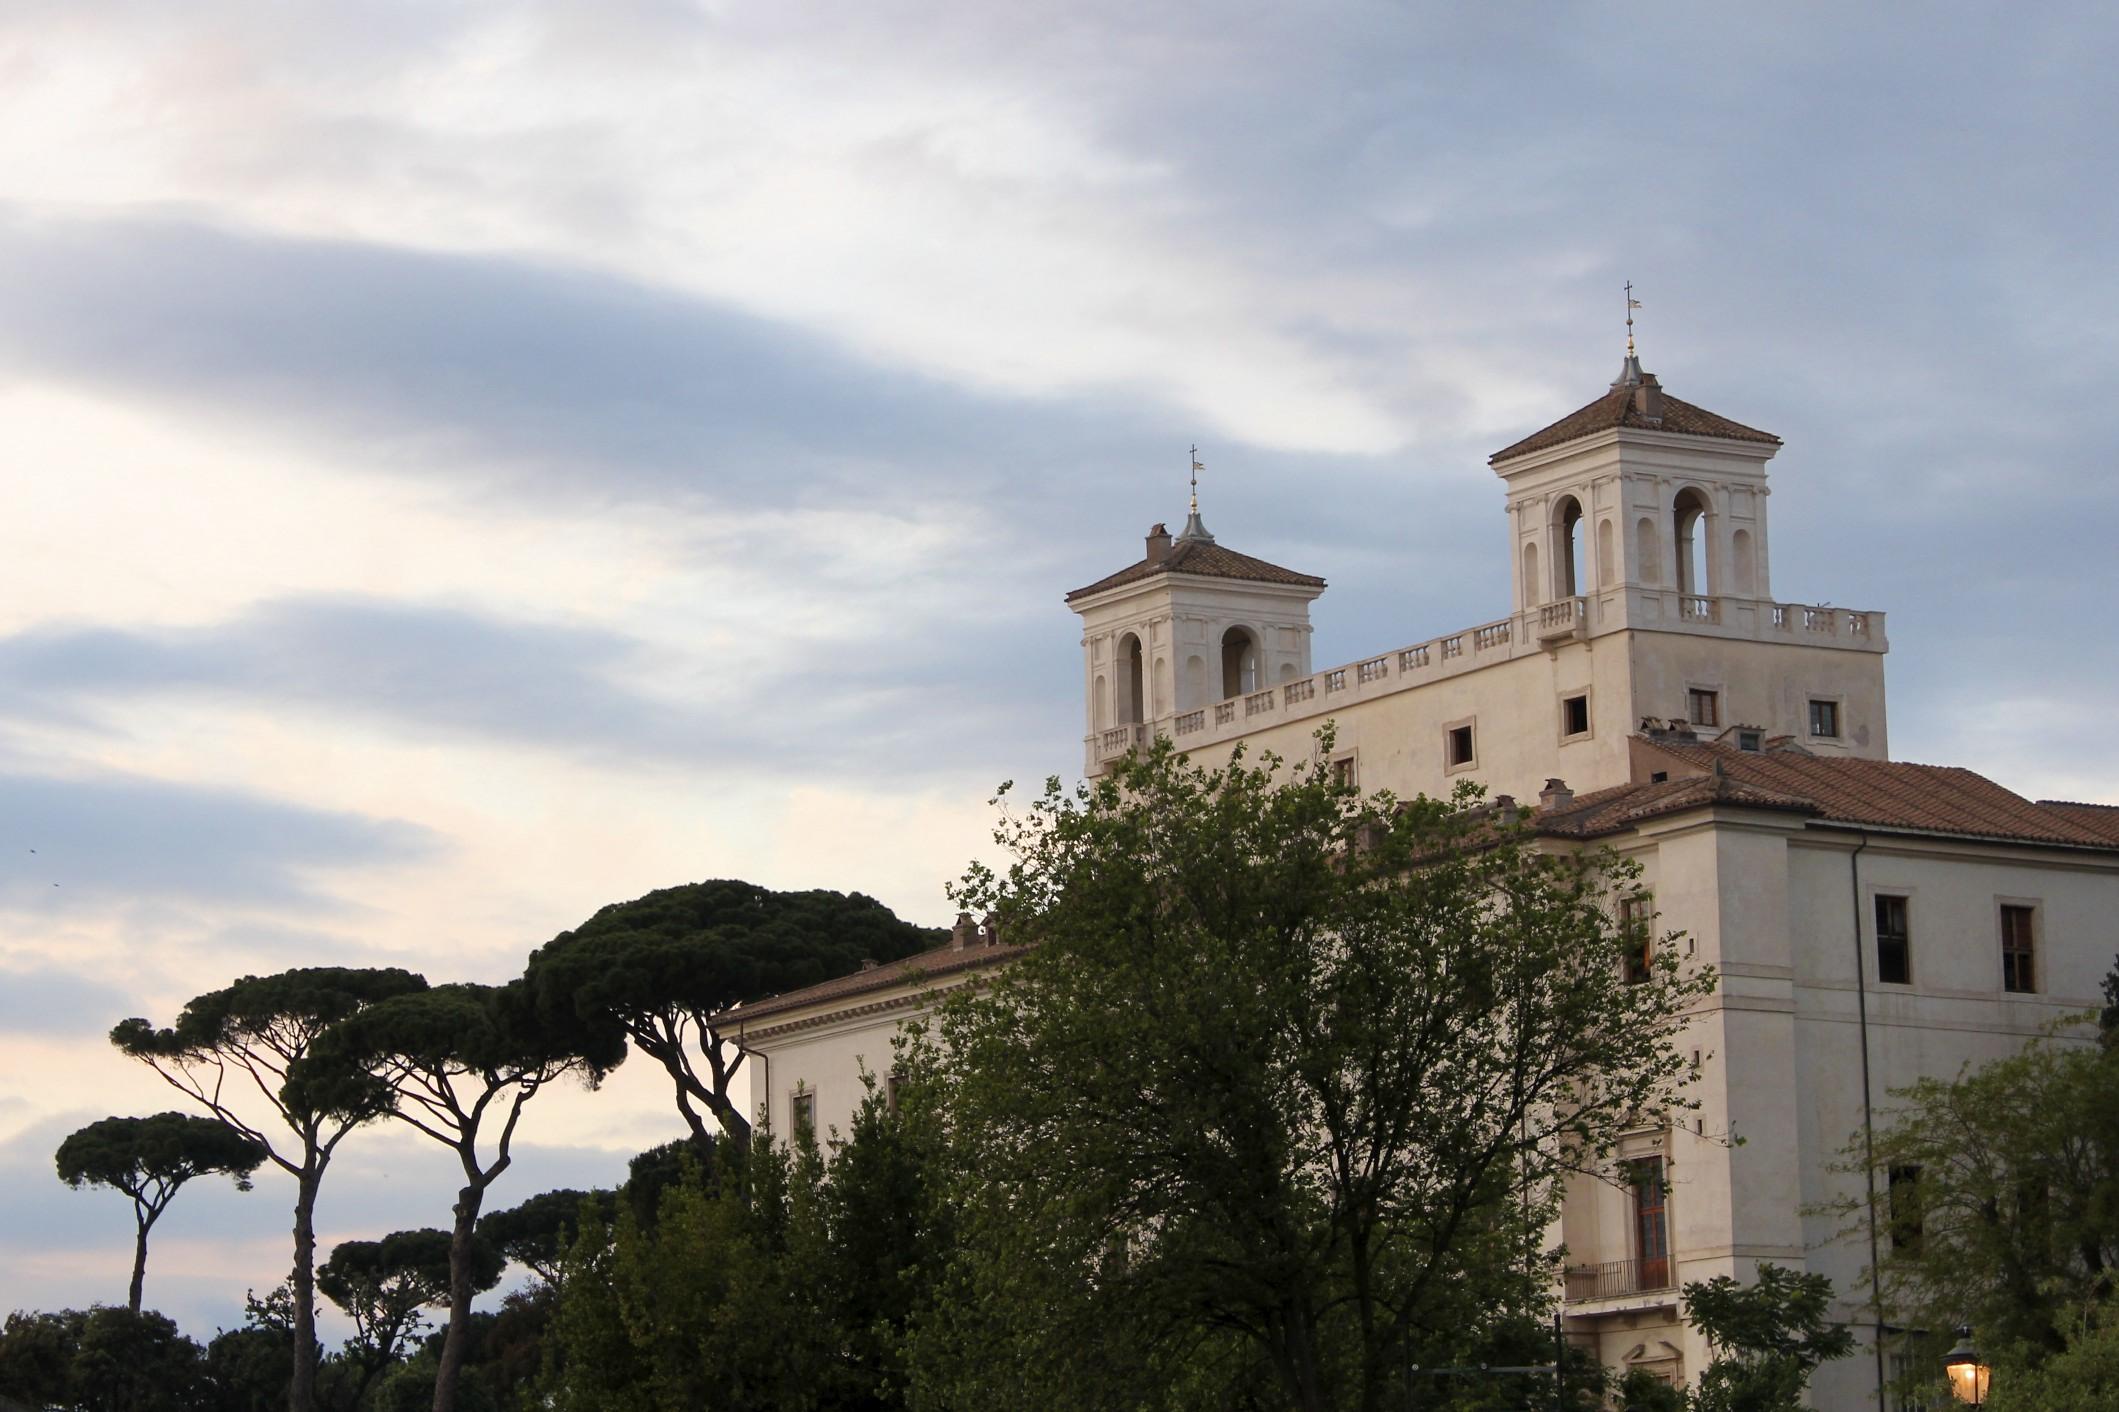 A Tuscan S Garden In Rome Loving Italy 39 S Gardens